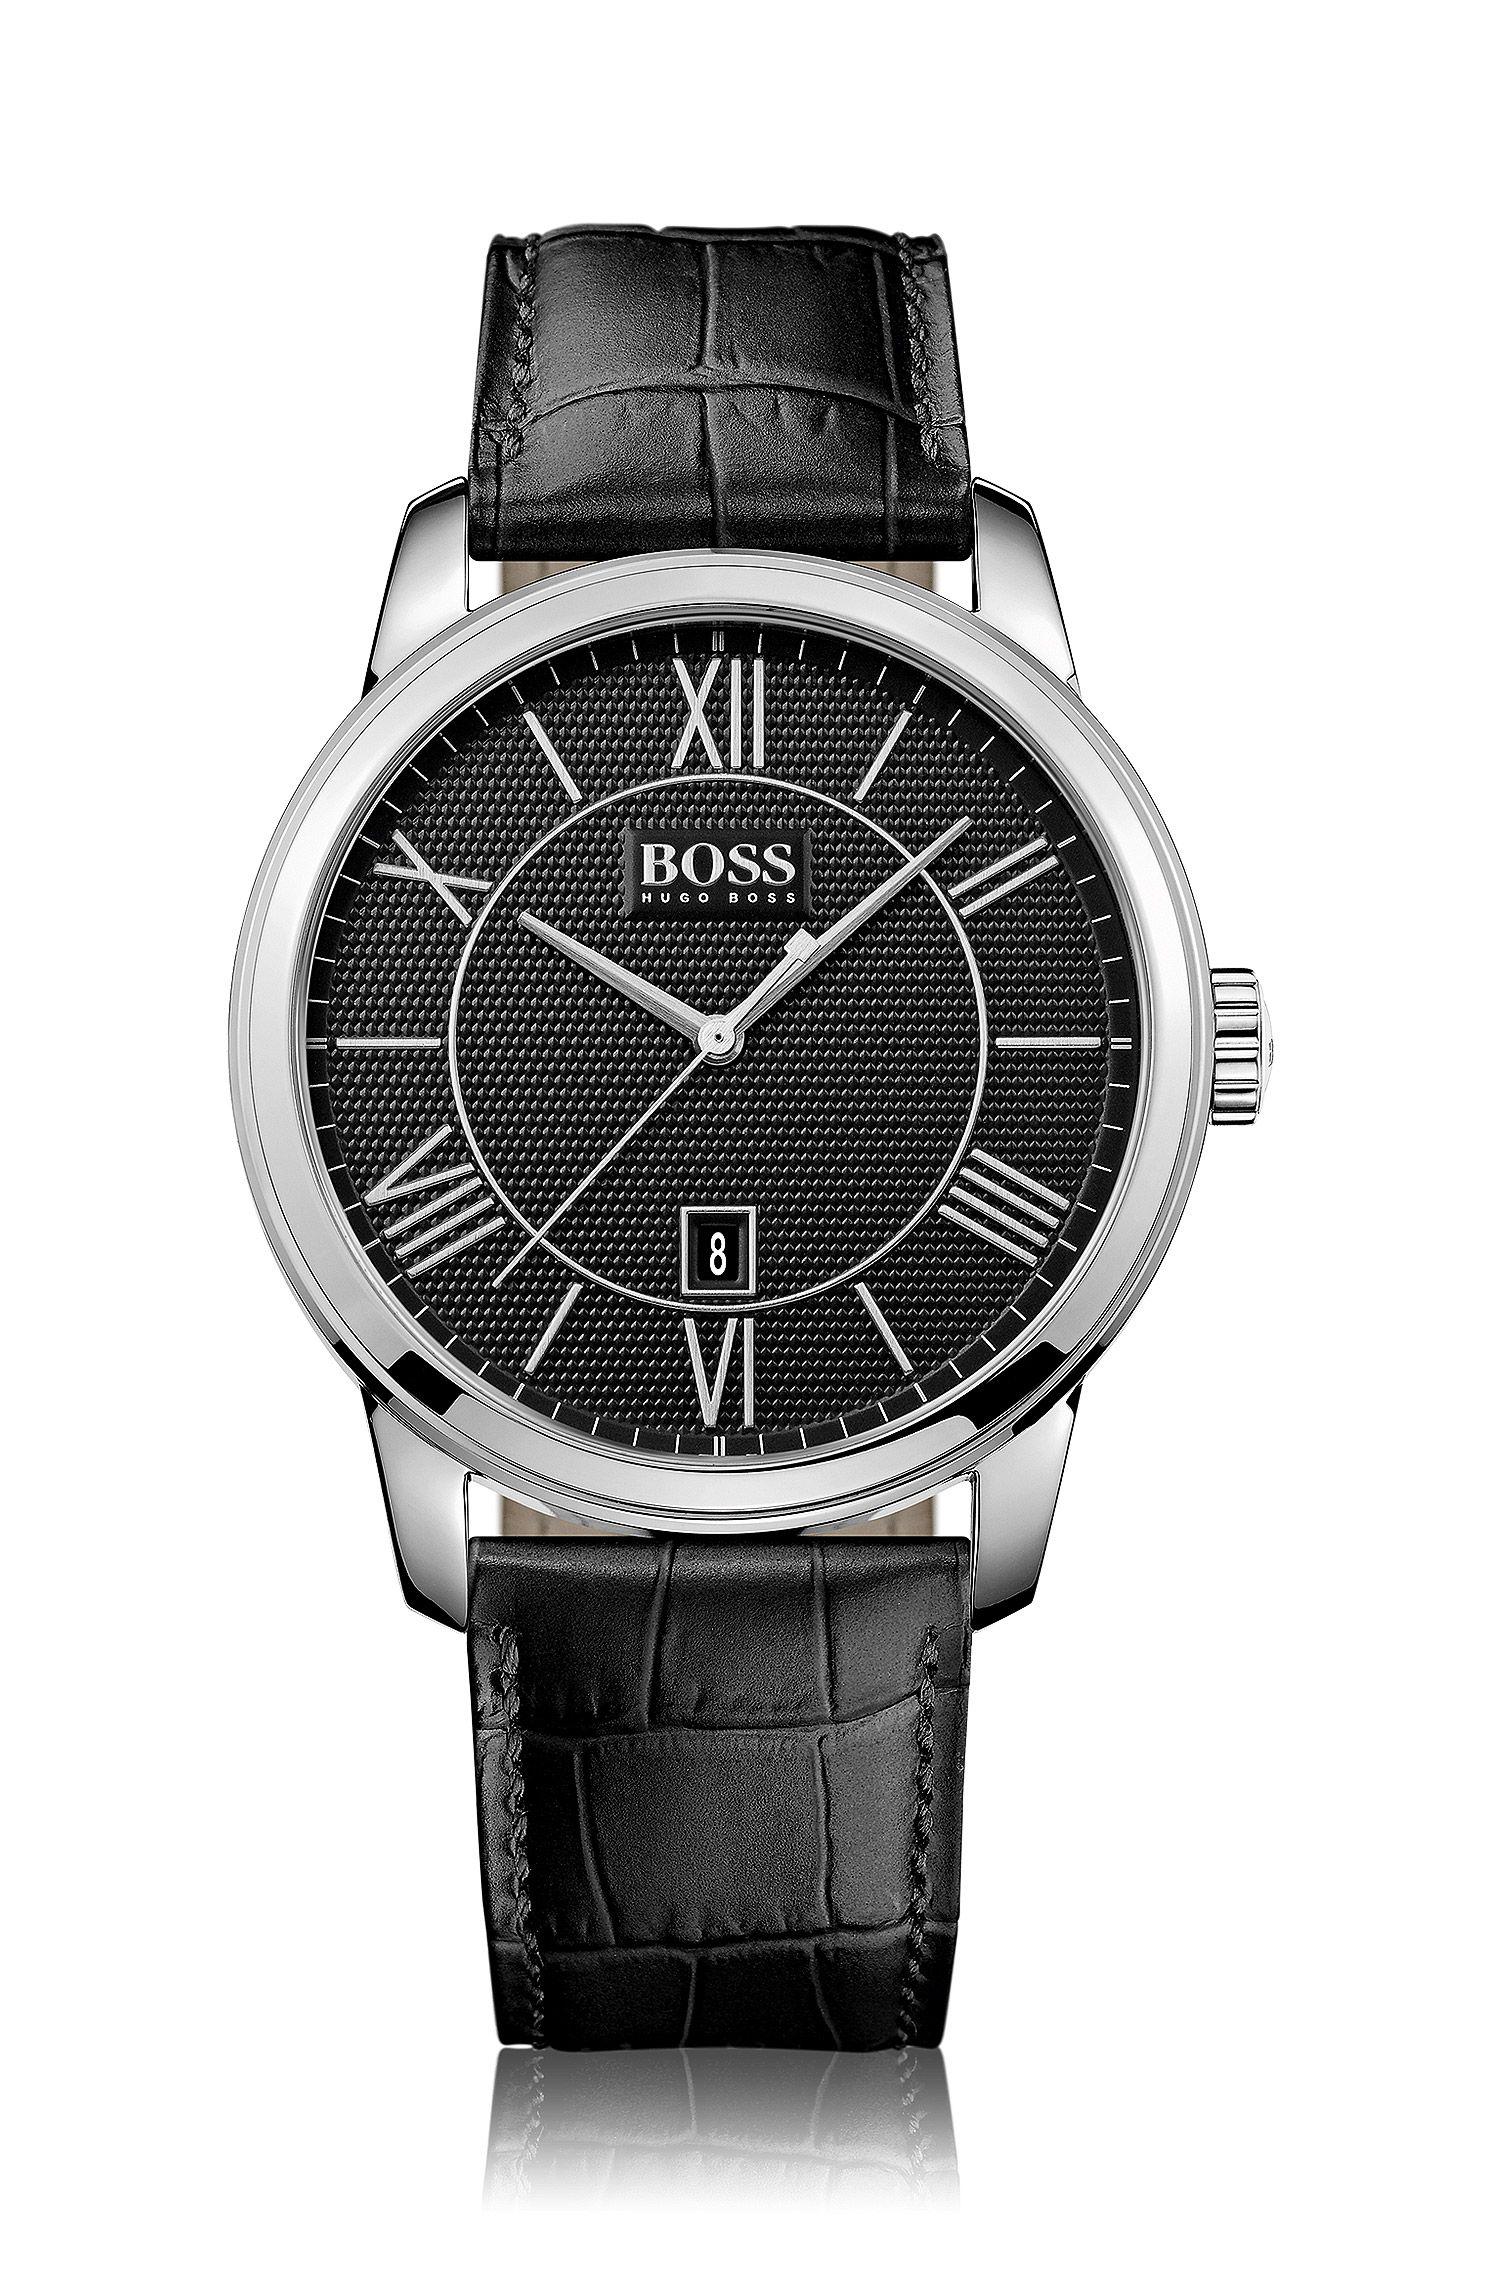 Montre-bracelet «HB6024» avec boîtier en acier inoxydable